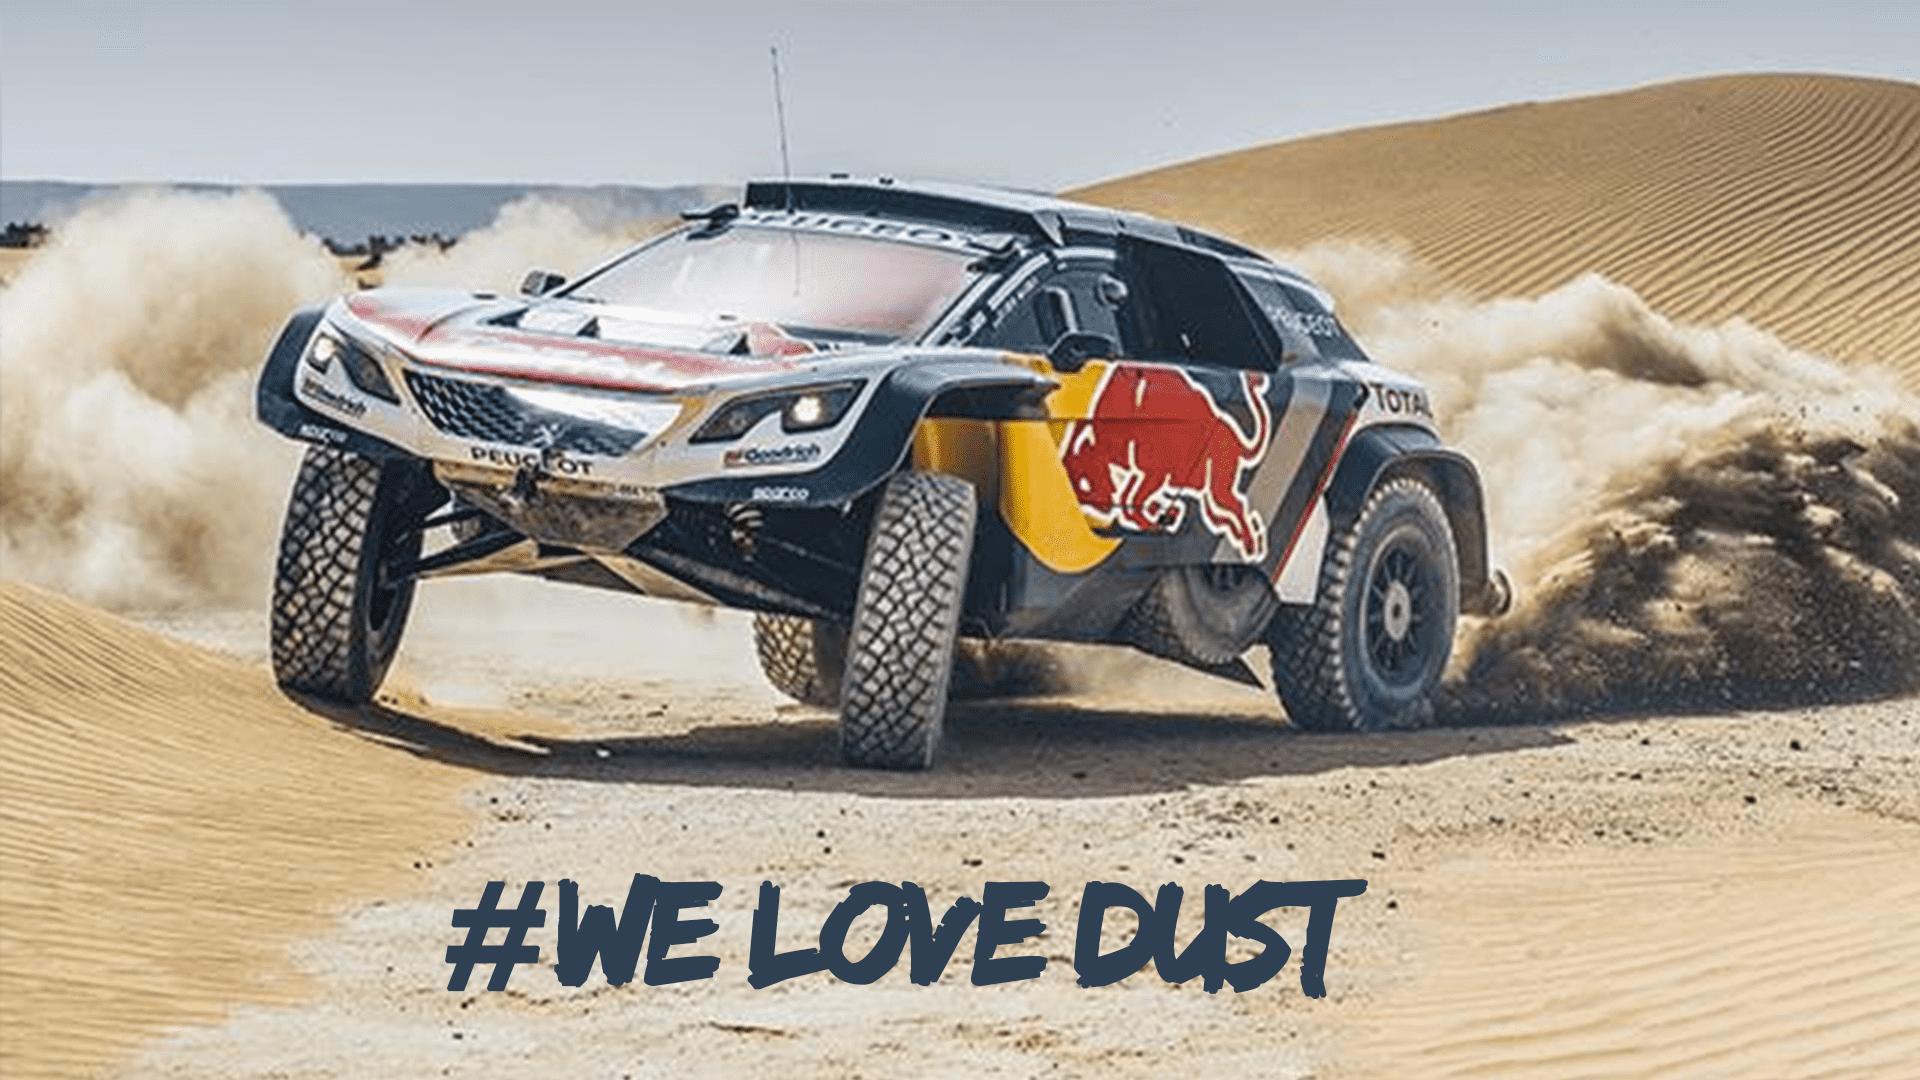 El Peugeot 3008DKR Maxi aspira a revalidar su título en la 40º edición del Rally Dakar